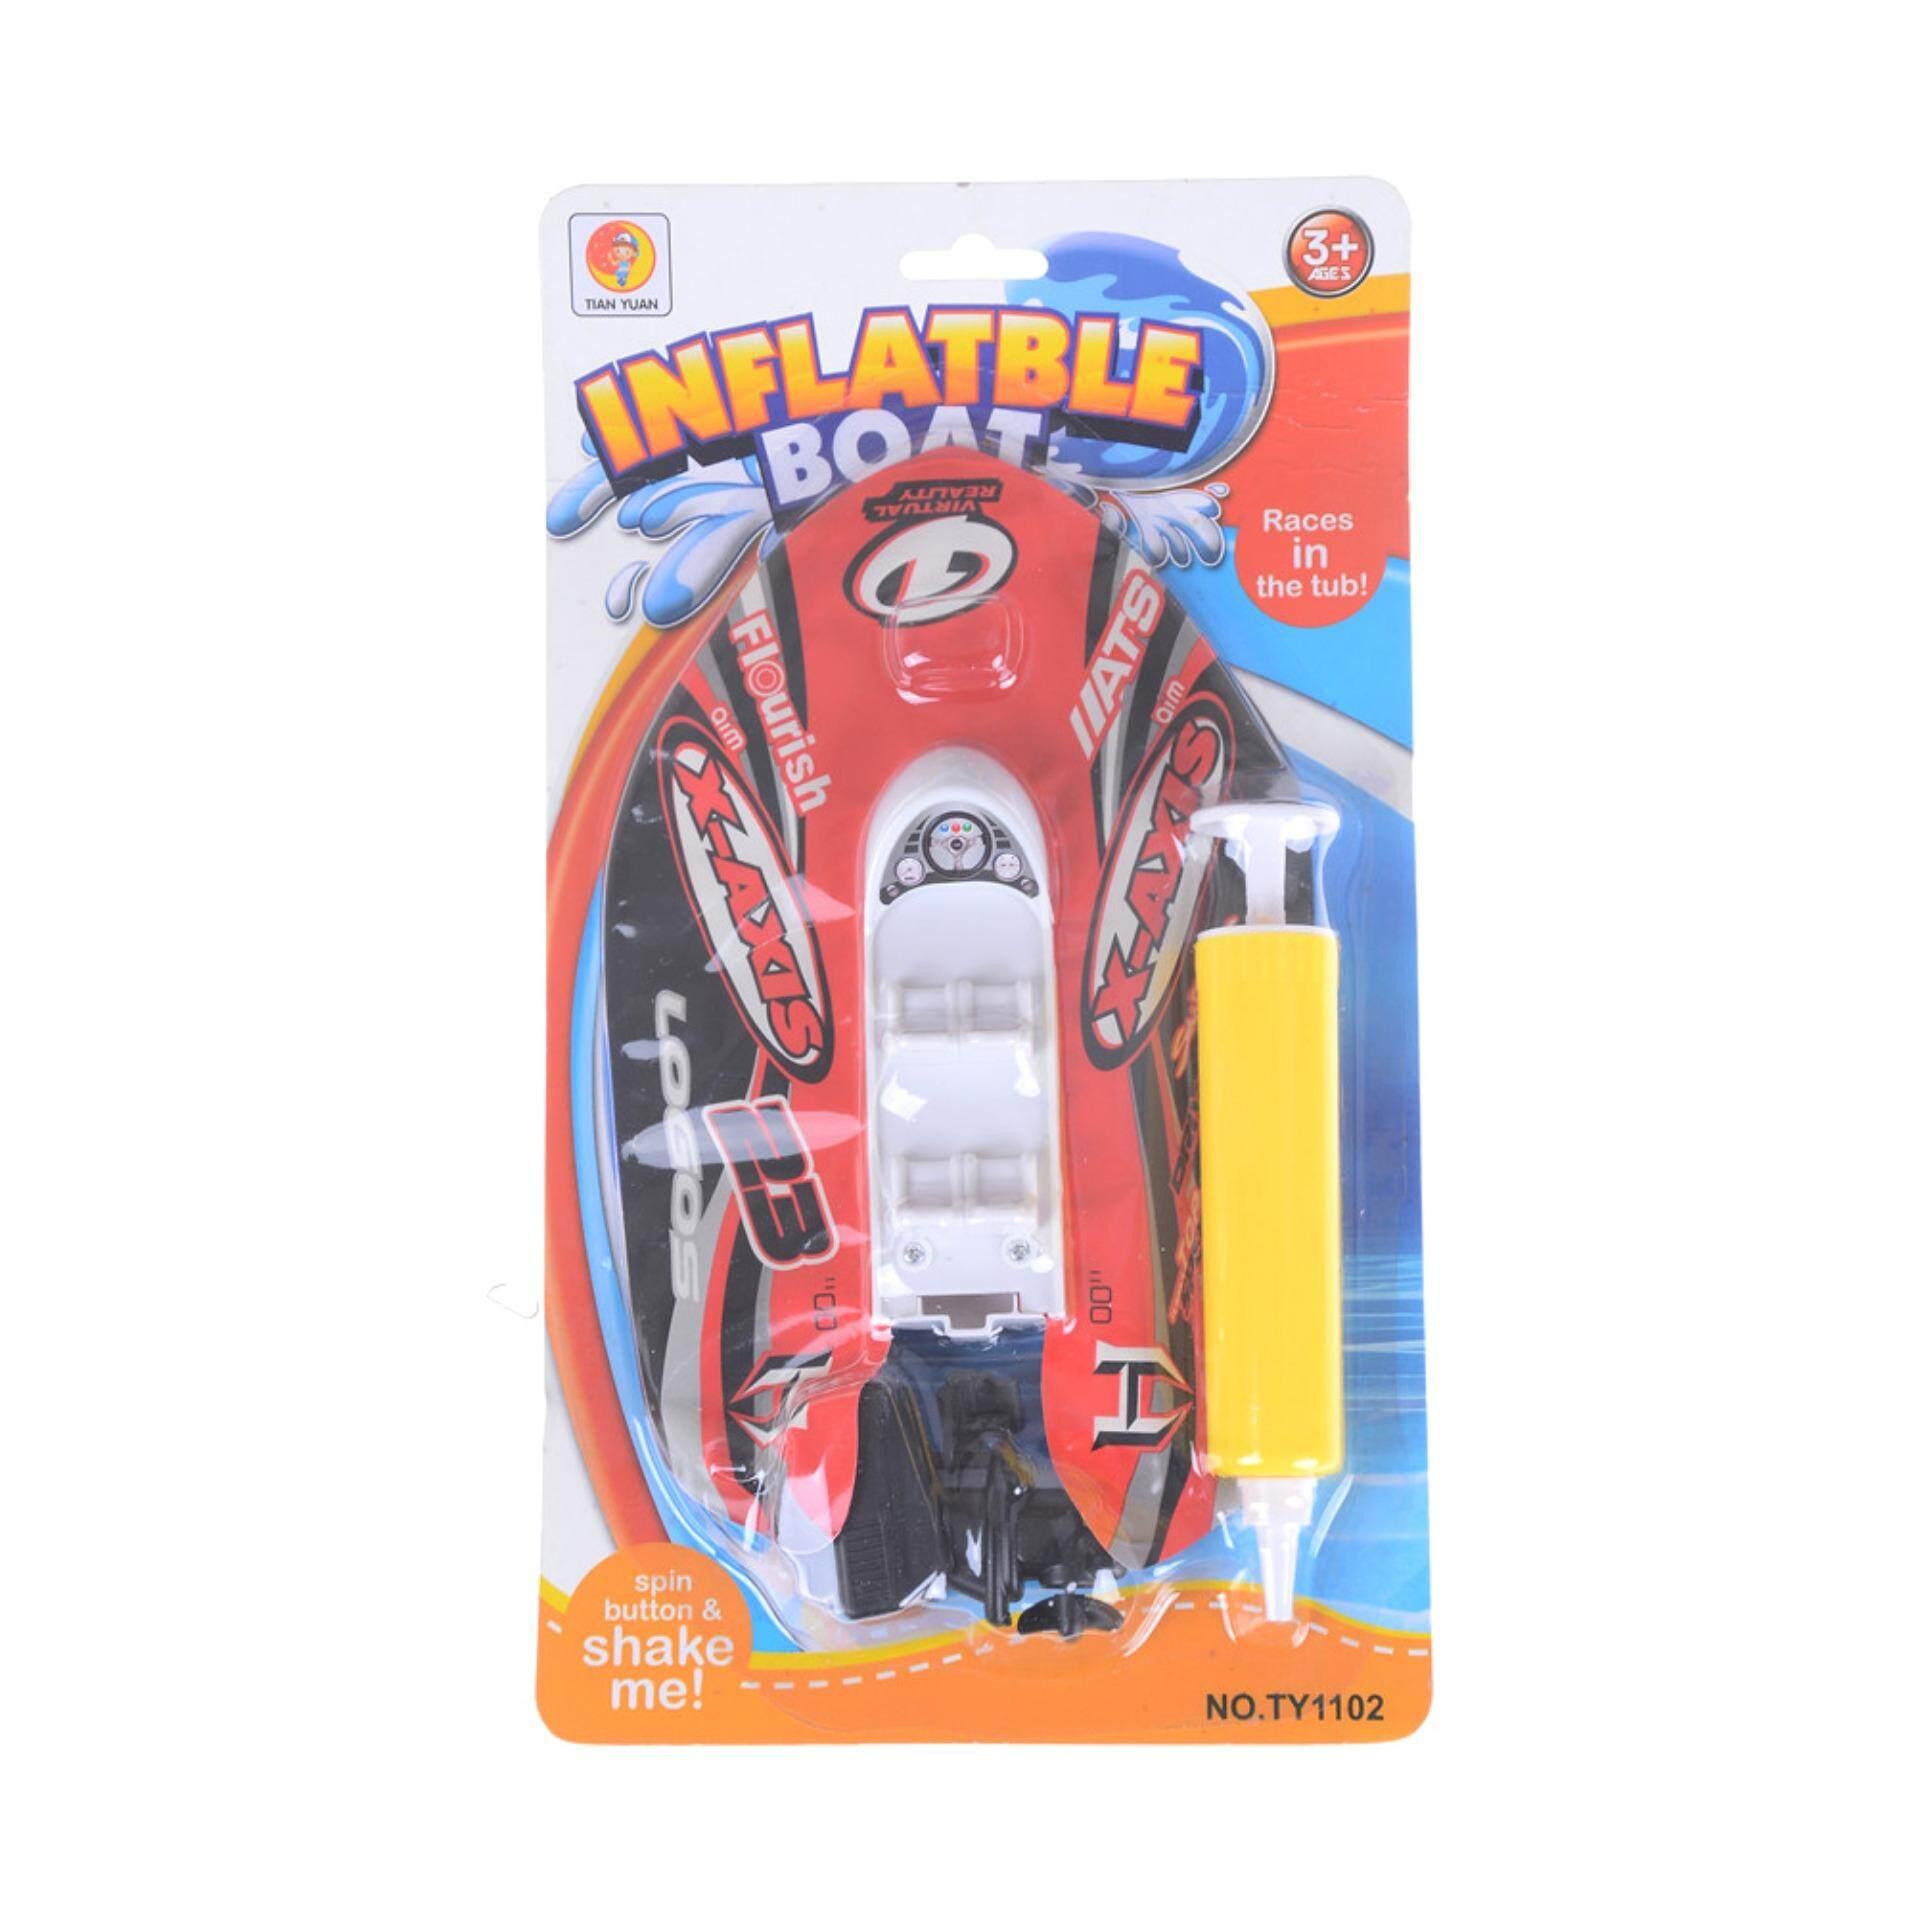 Hình ảnh Summer Kids Toys Boat Wind Up Inflatable Motorboat Colorful Speedboat Bath Toys Red